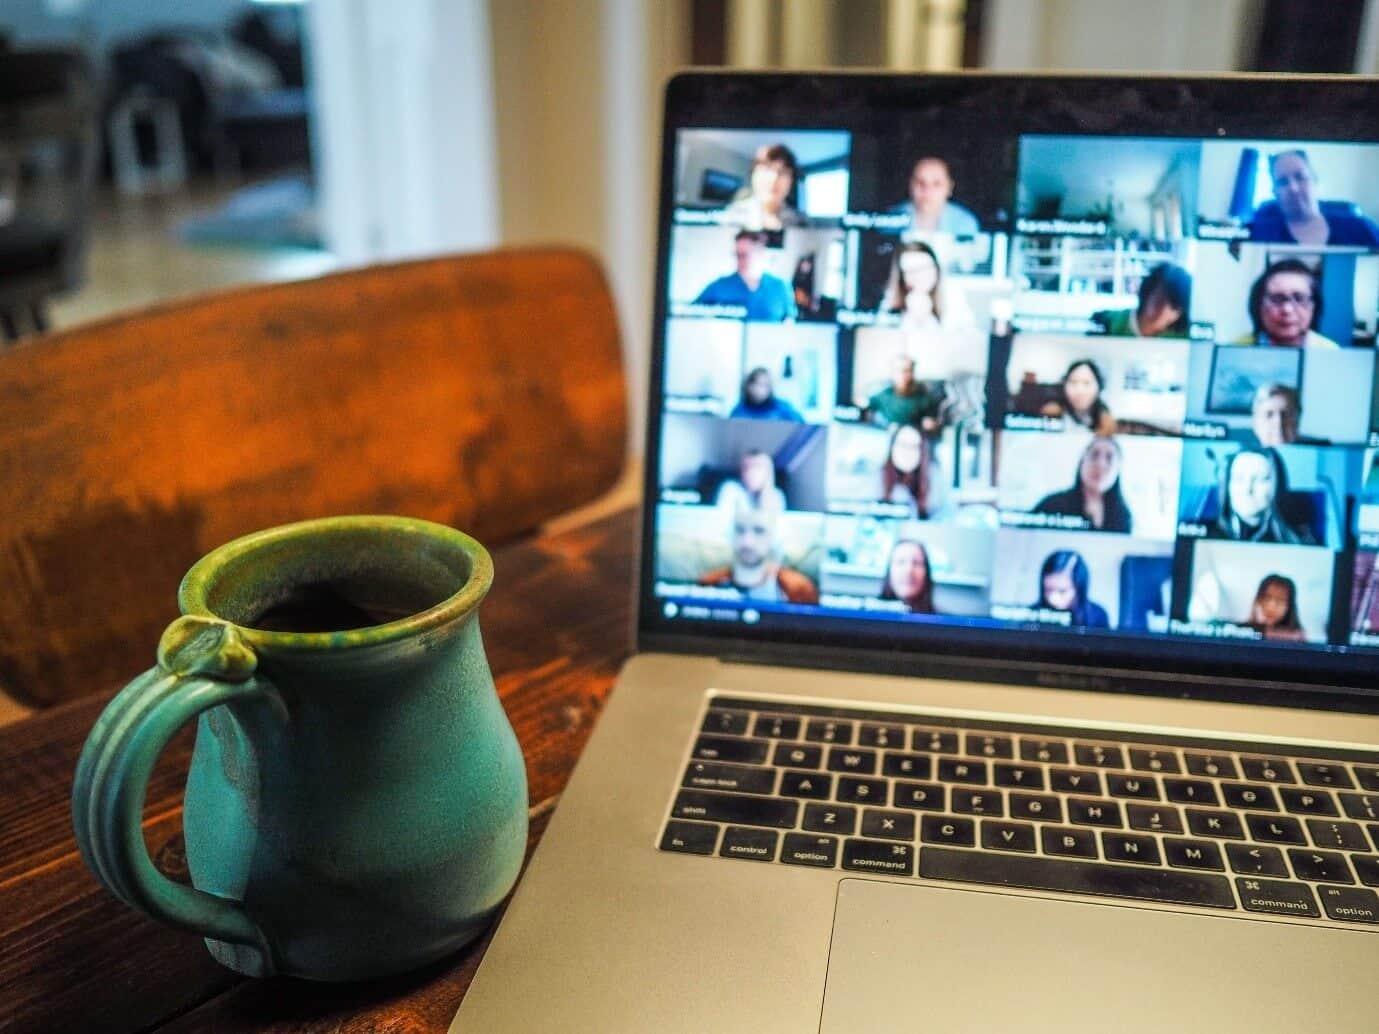 content/en-in/images/repository/isc/2020/videoconferencing1.jpg